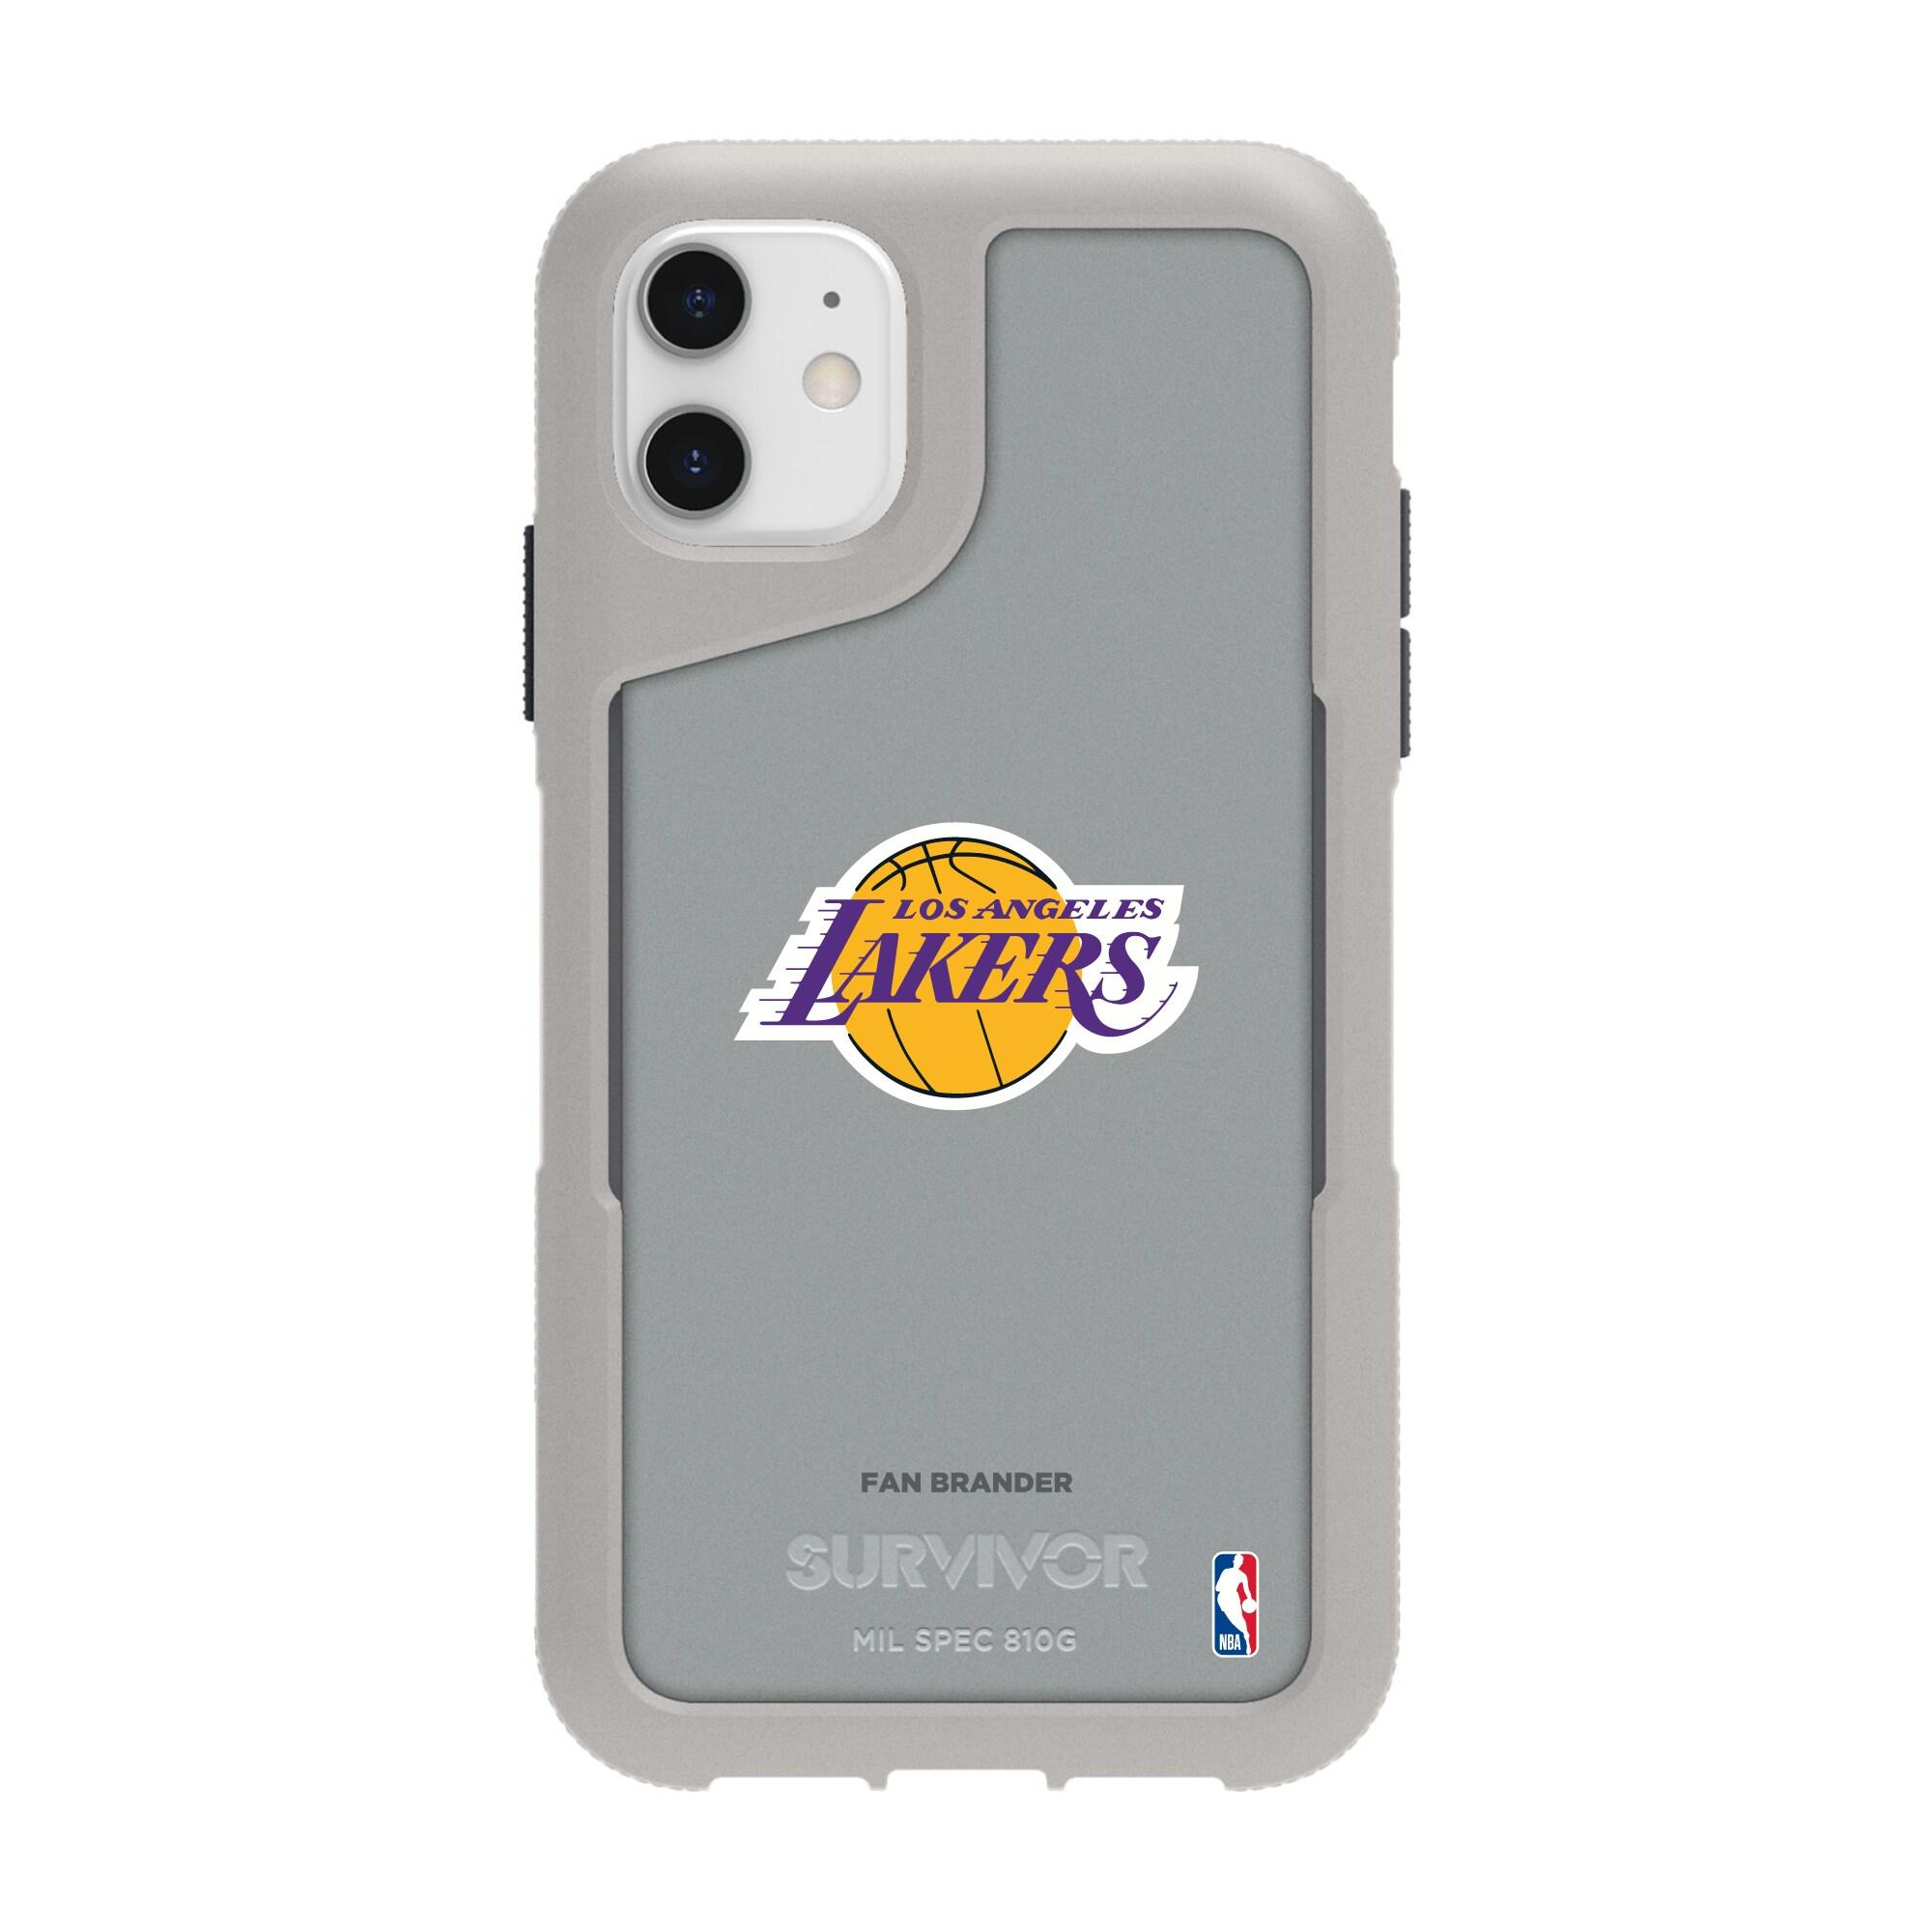 Los Angeles Lakers Griffin Survivor Endurance iPhone Case - Gray